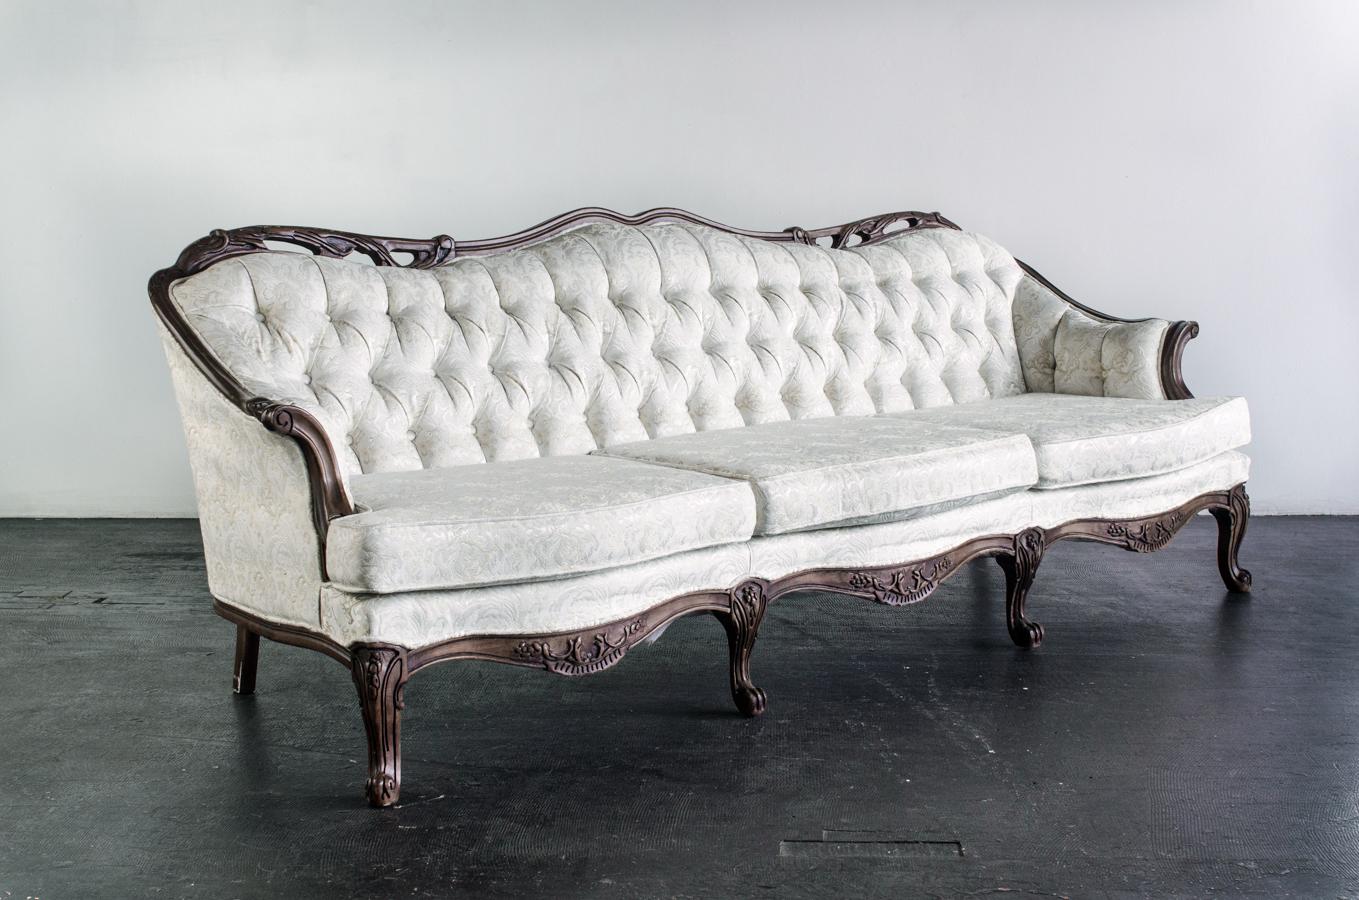 Vintage Sofa French Provincial Ivory  Amigo Party Rentals